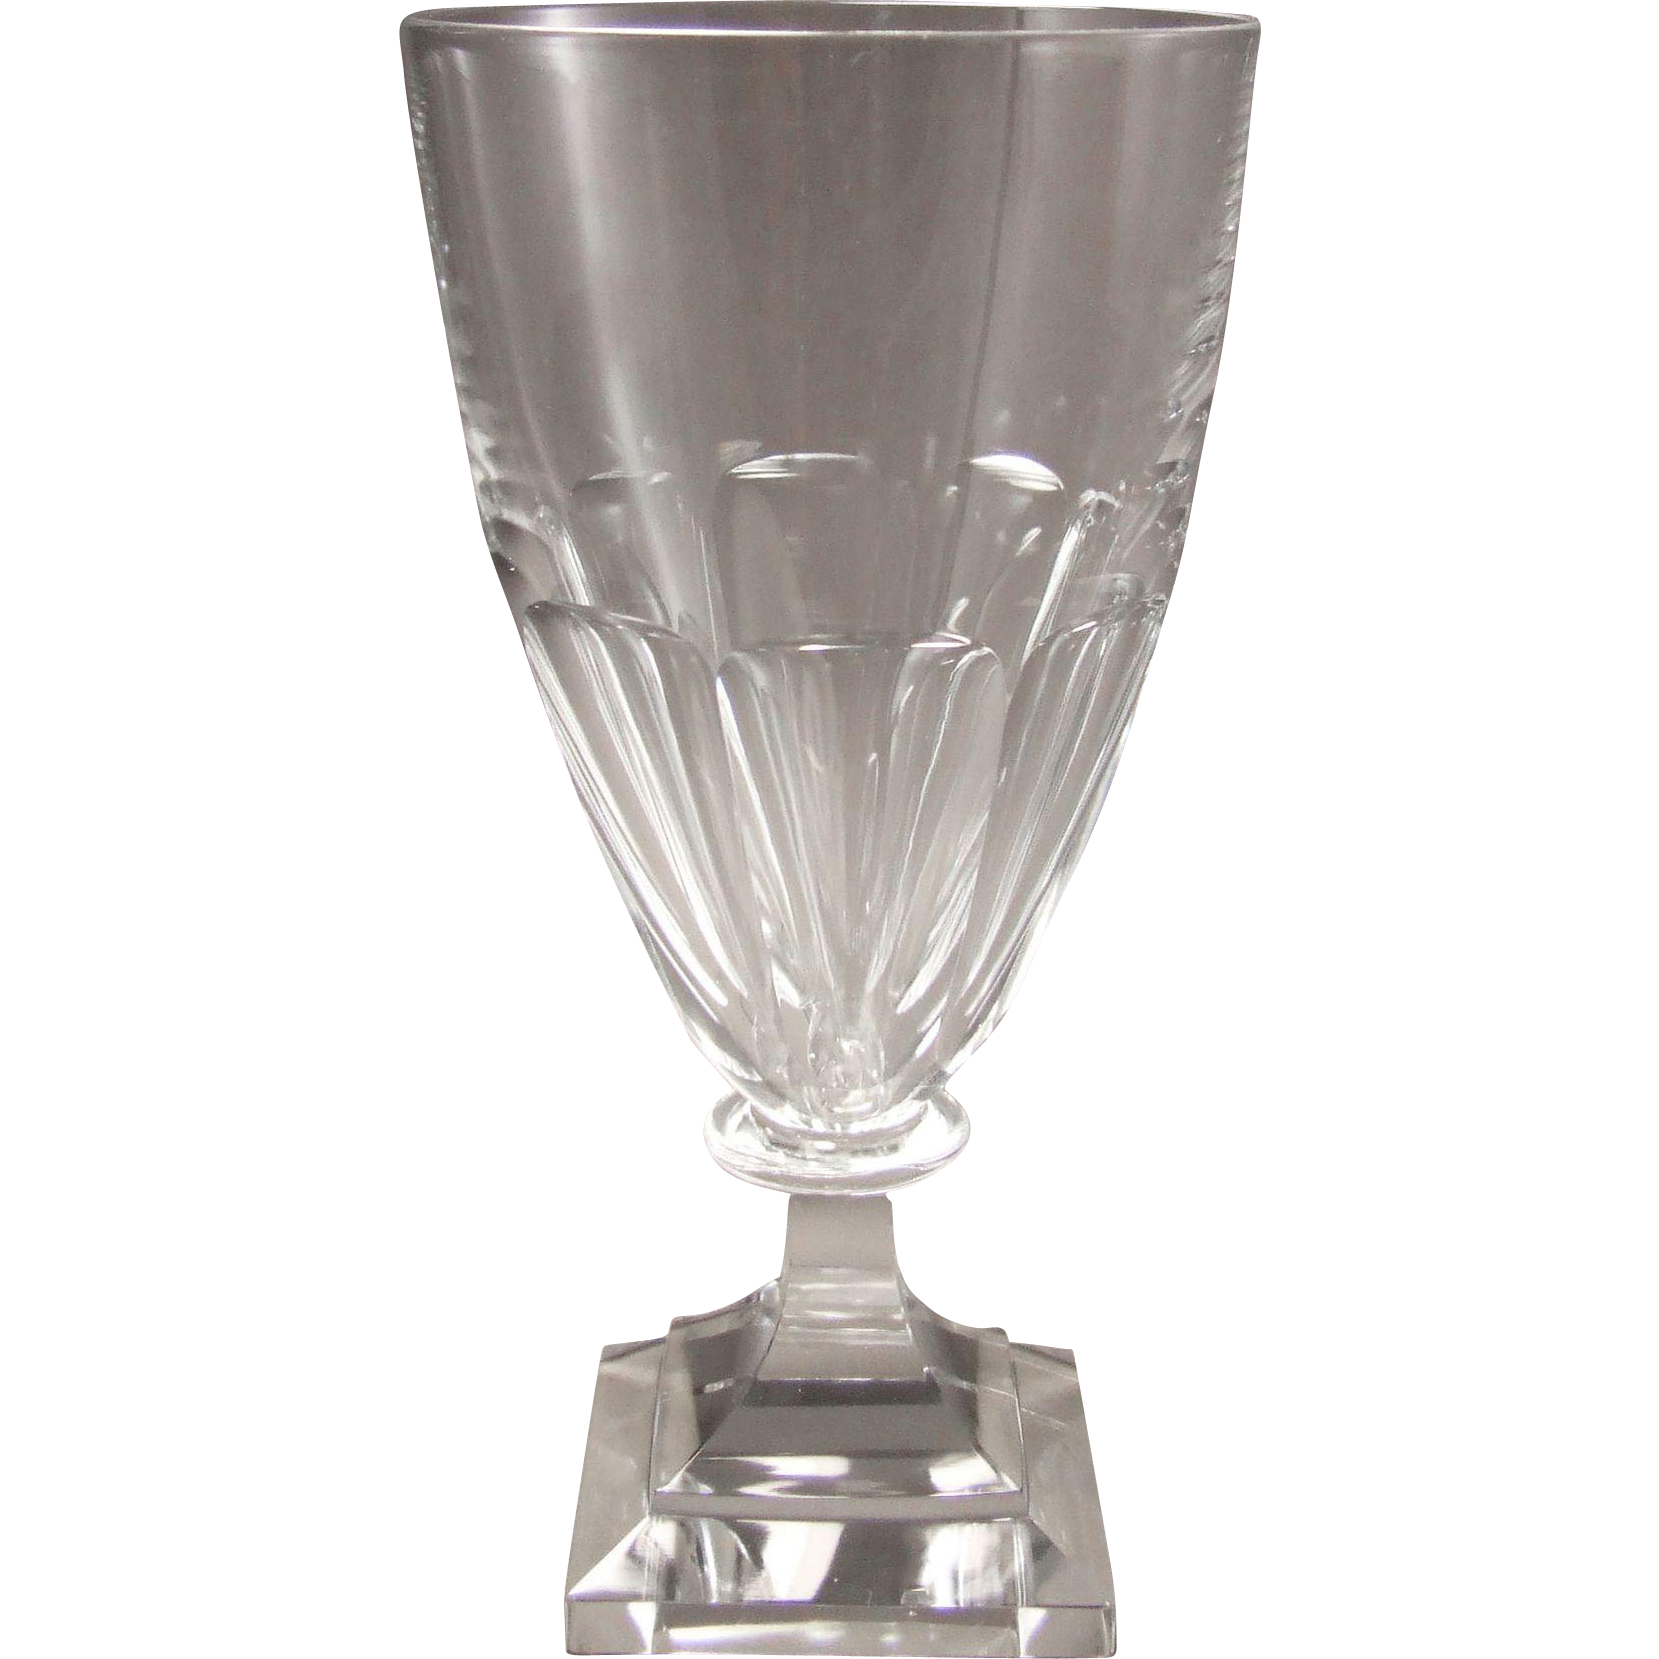 Kosta Boda Sweden Maleras Solenn Water Goblet